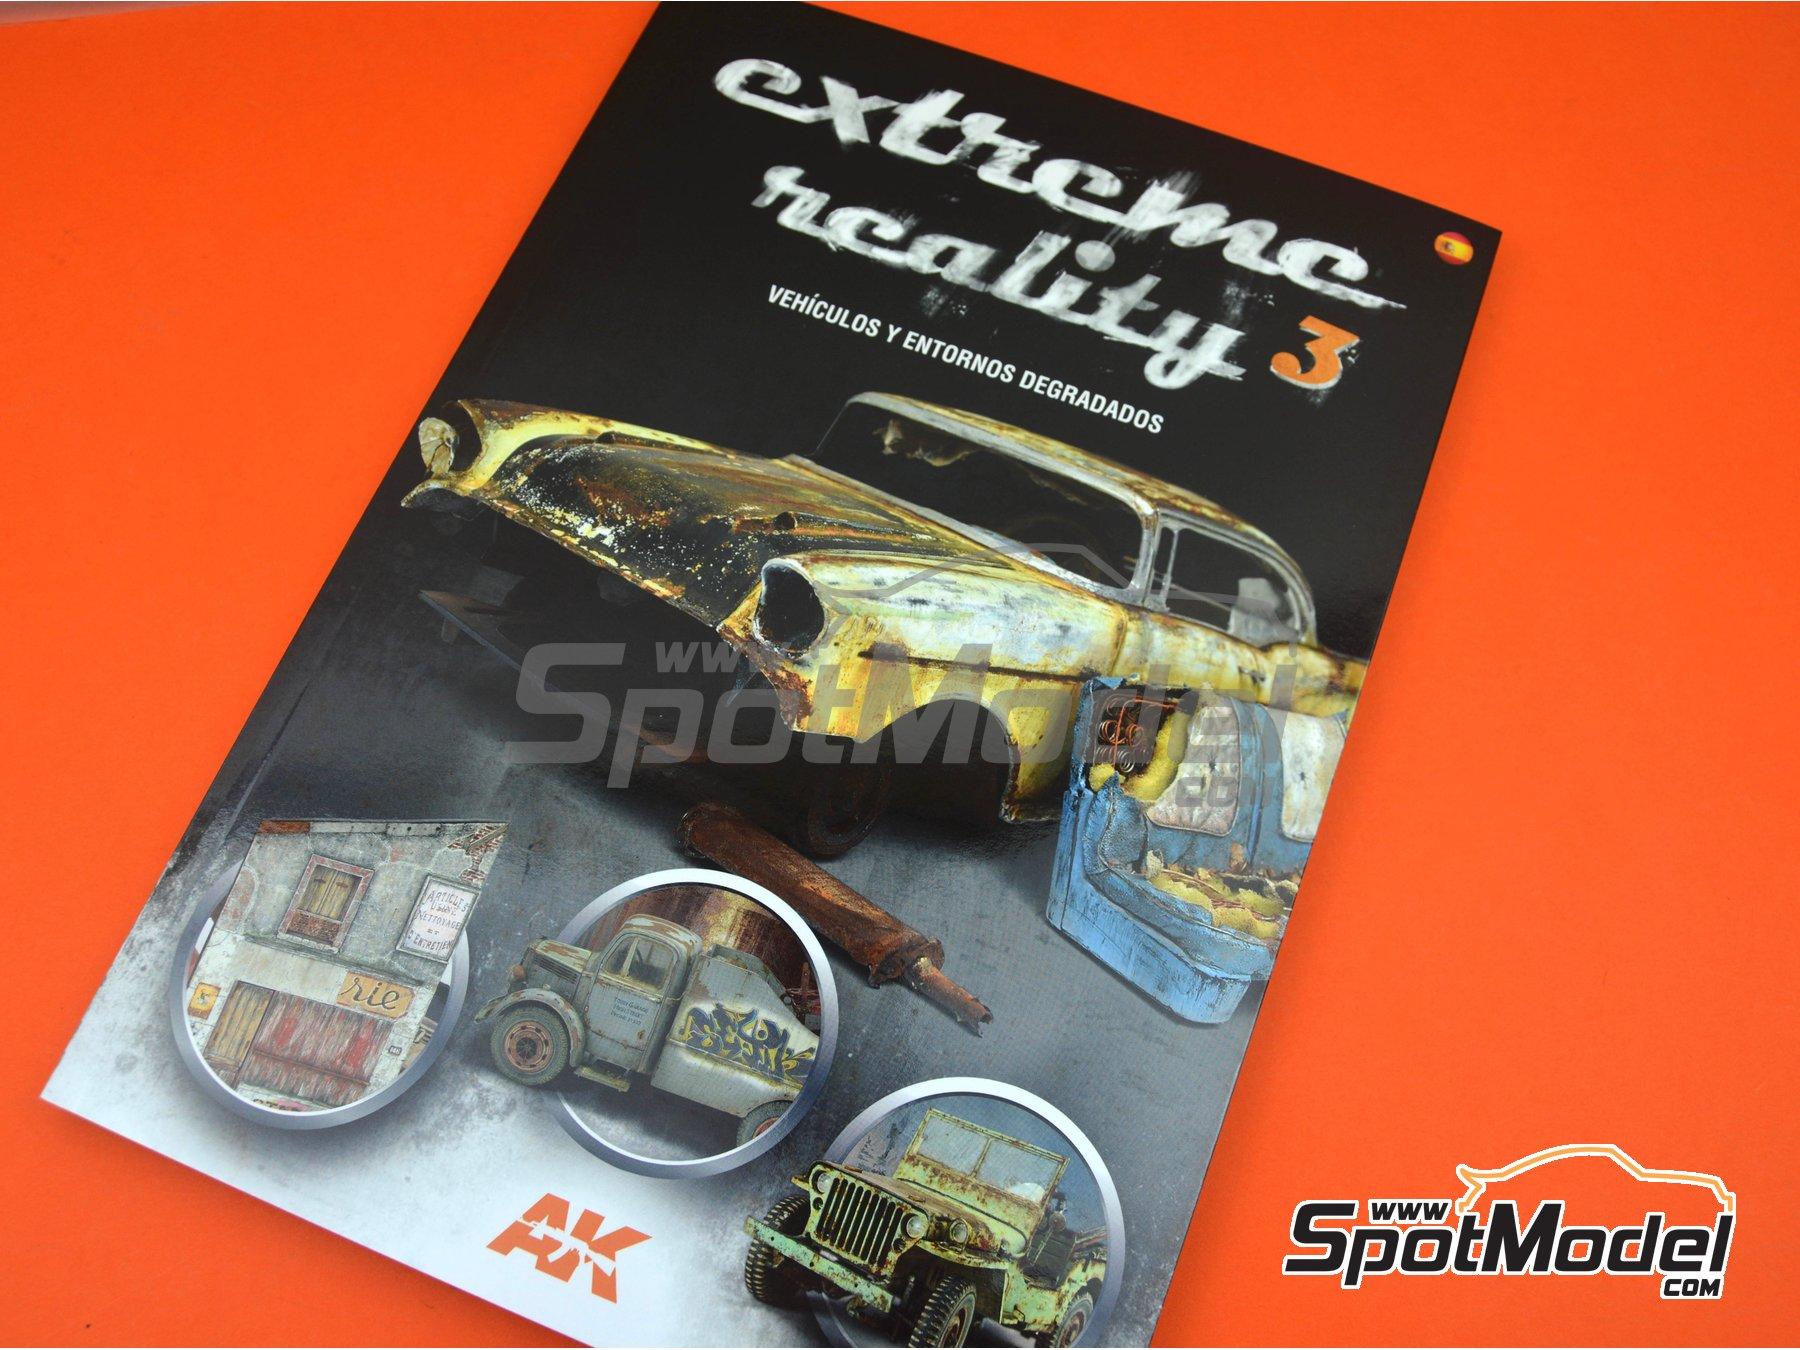 Image 7: Extreme Reality 3 - Vehiculos y entornos degradados | Book manufactured by AK Interactive (ref.AK-509)